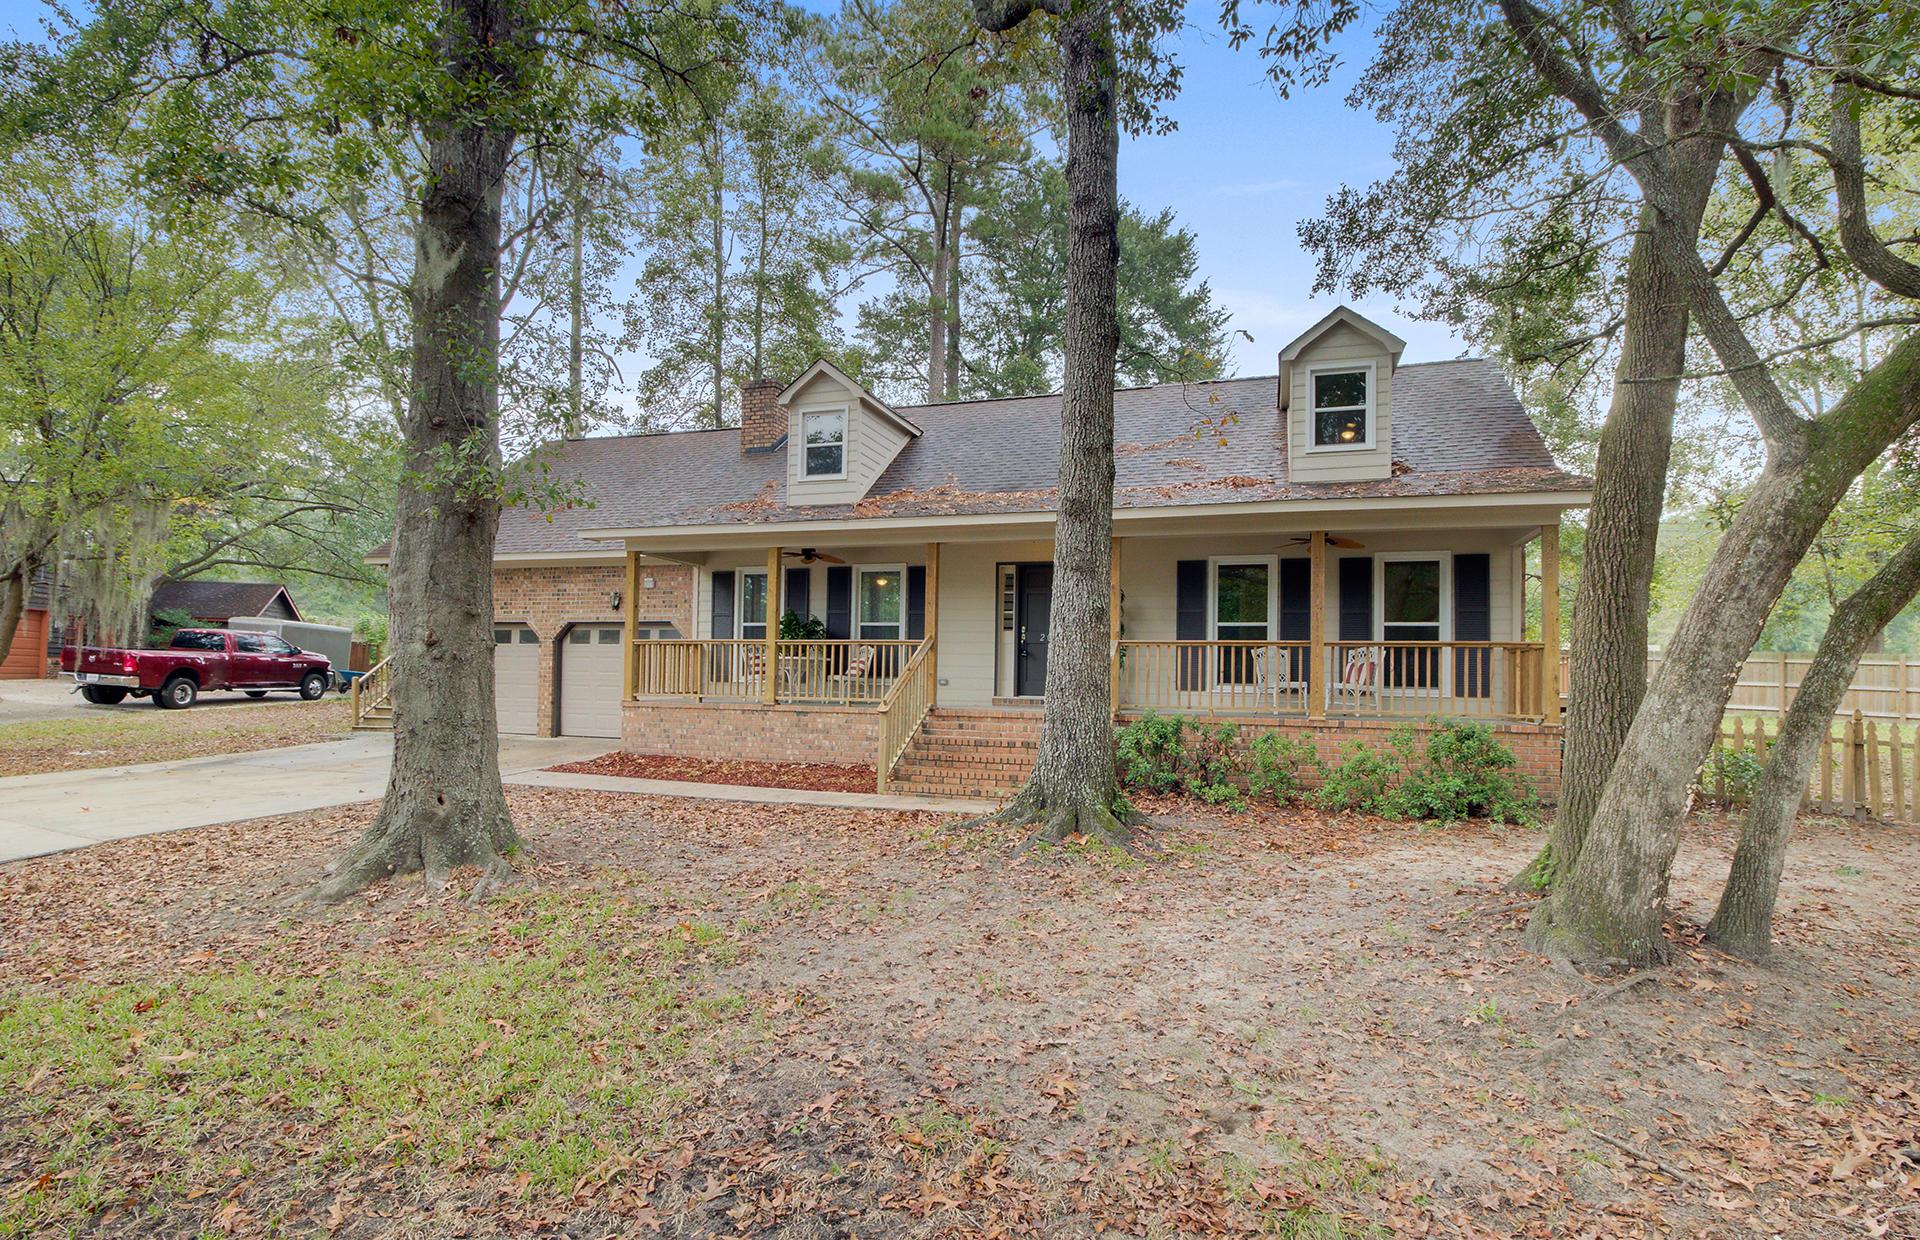 White Church Place Homes For Sale - 208 Glebe, Summerville, SC - 3